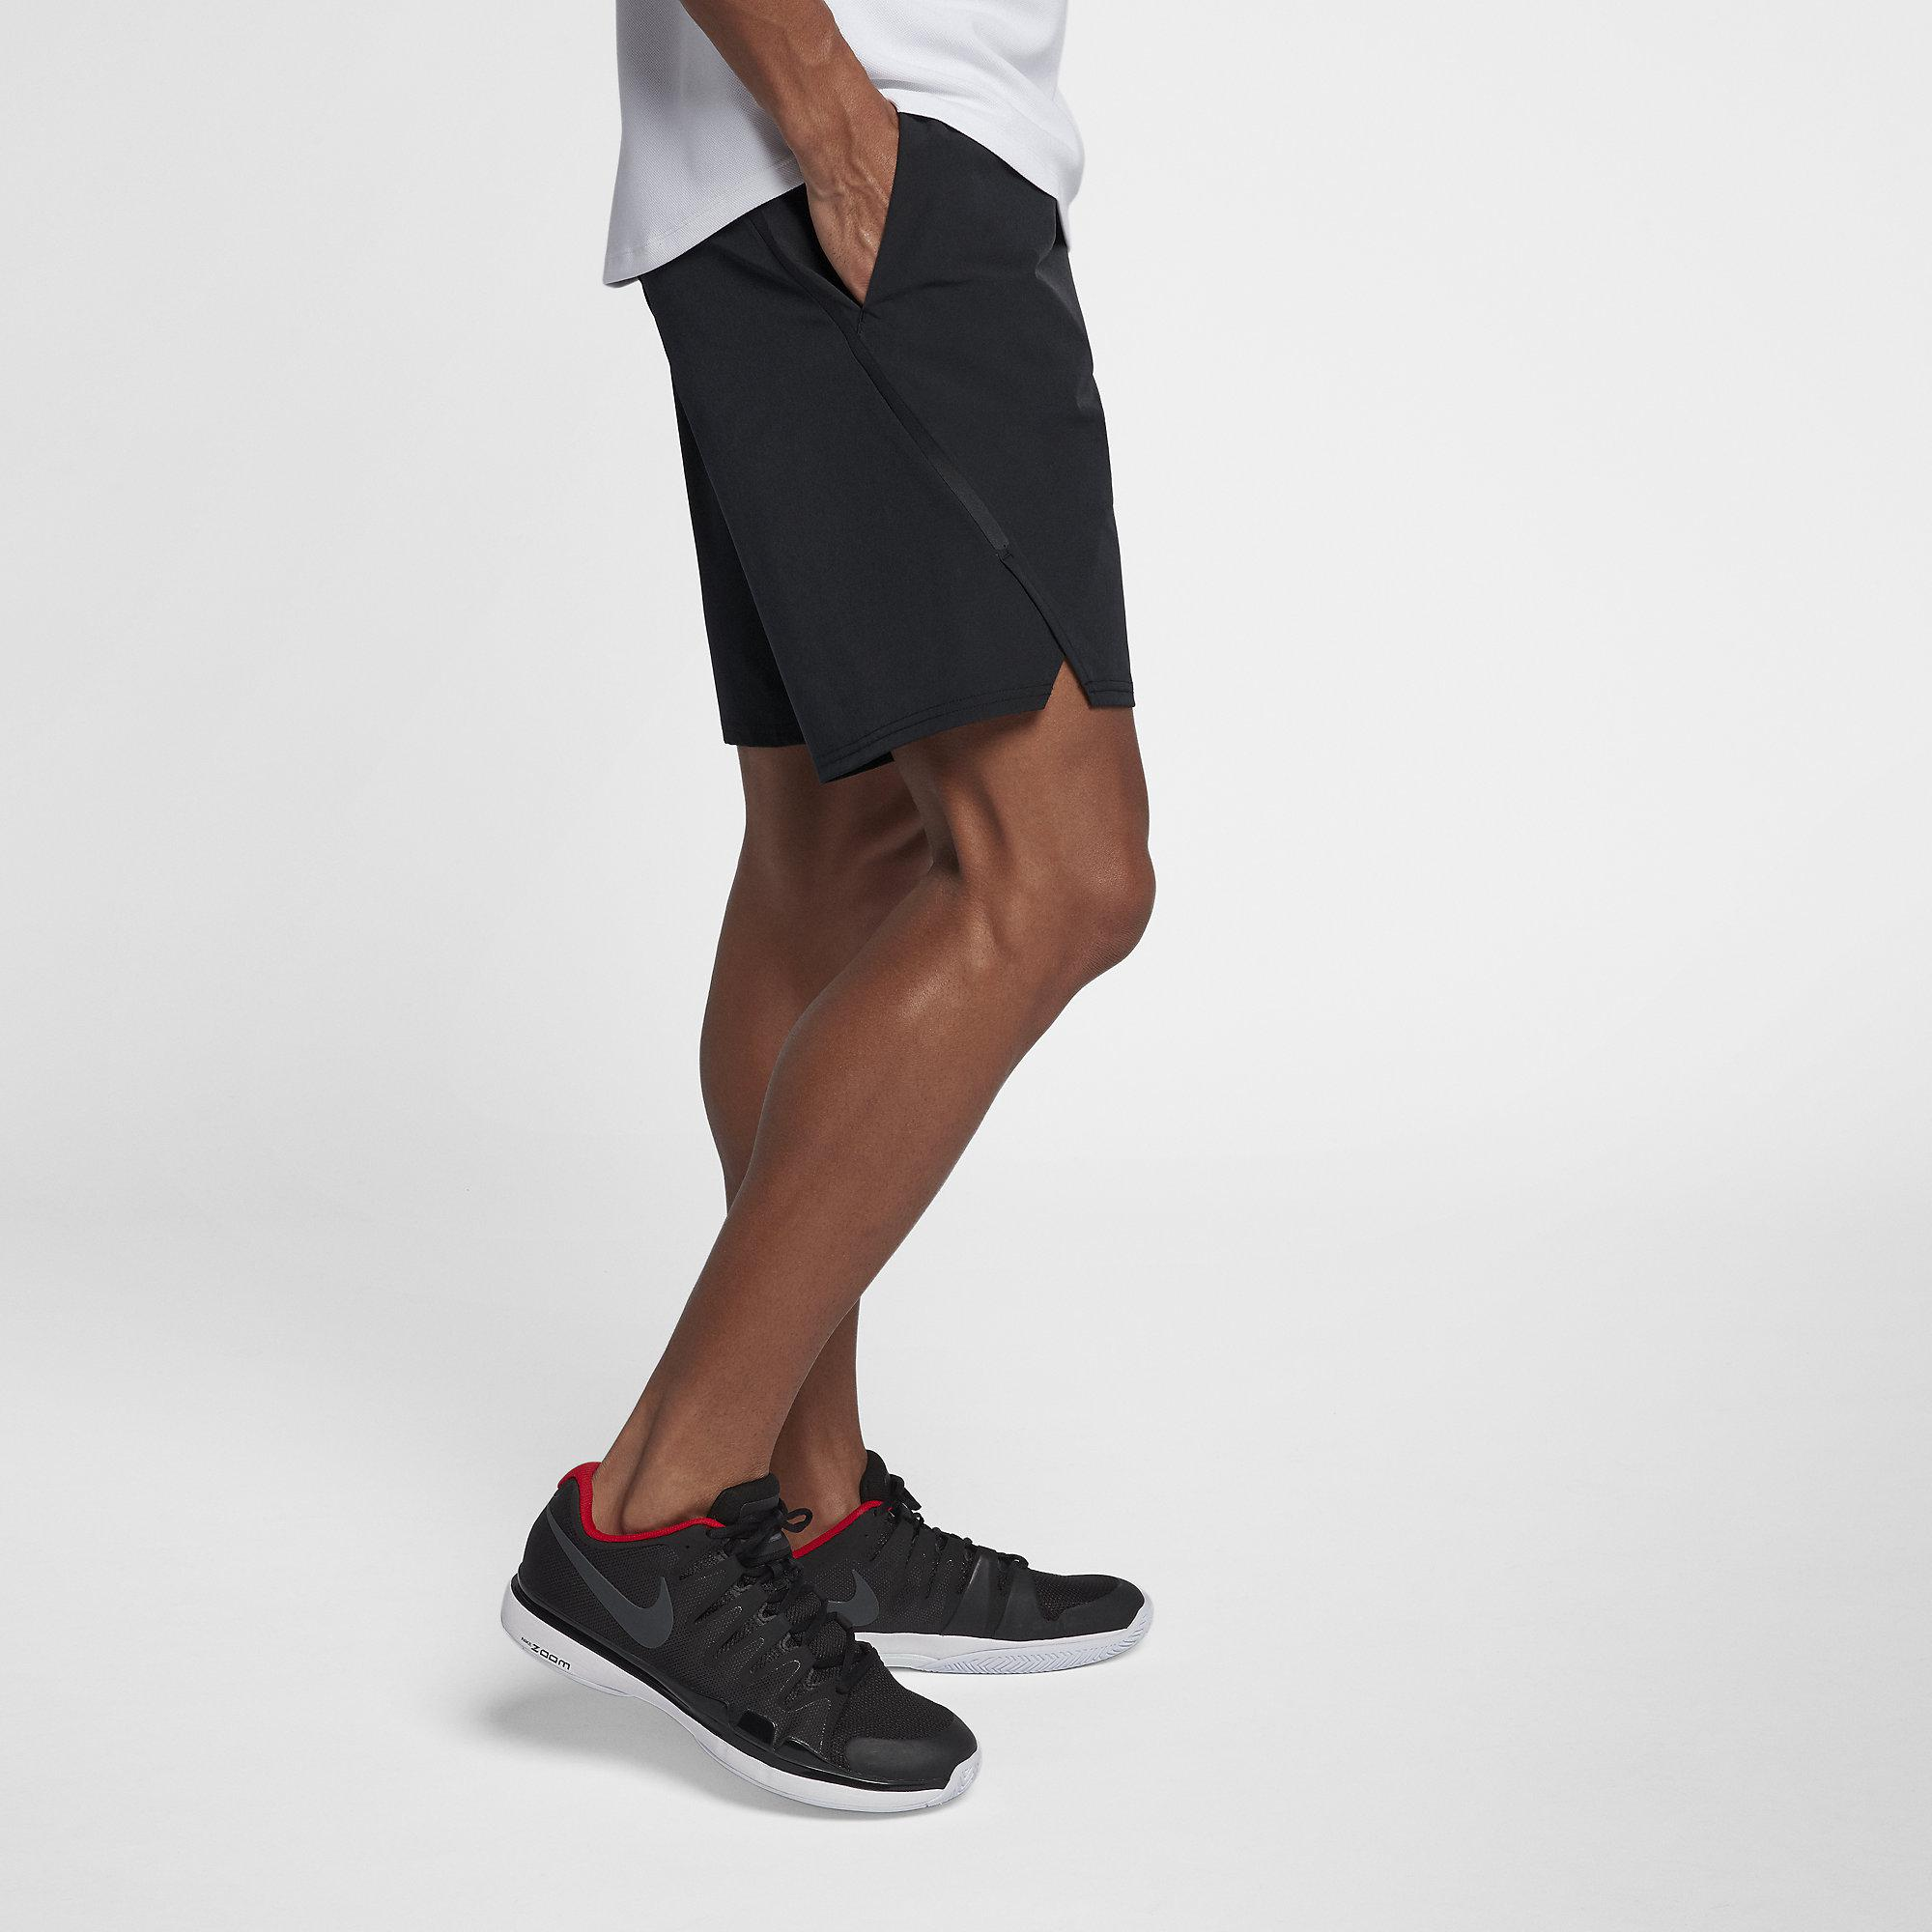 3cd2ac0f78ef8 Nike Mens Flex Ace 9 Inch Shorts - Black White - Tennisnuts.com